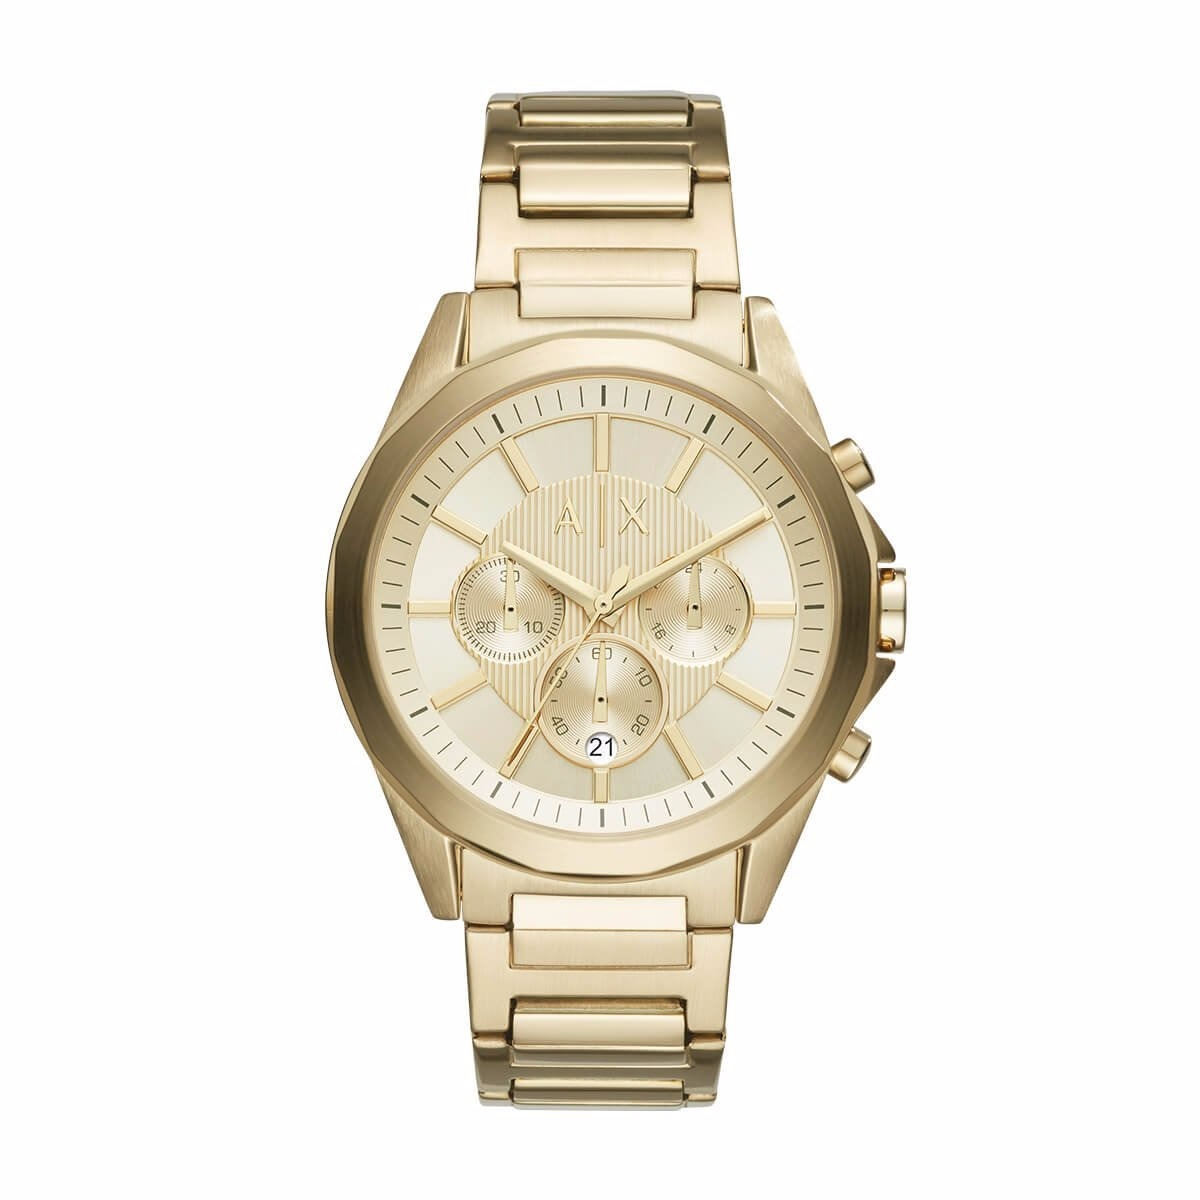 0be97c5c4c63 reloj armani exchange dorado cronógrafo ax2099 caballero. Cargando zoom.